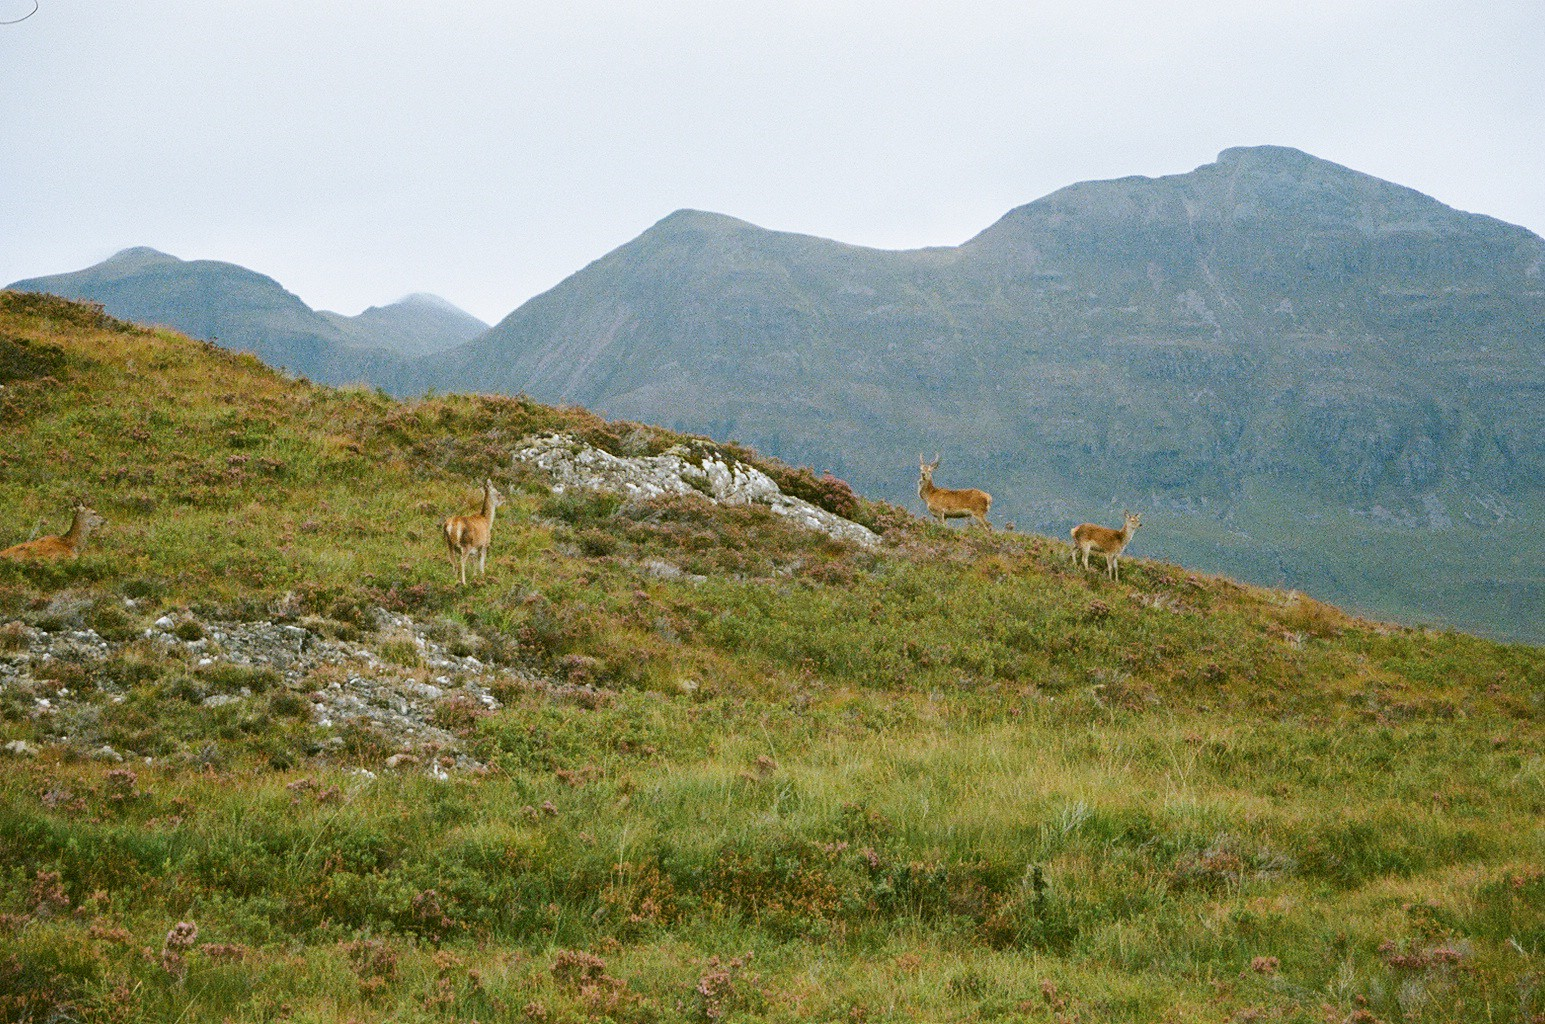 The Little Magpie Scotland Photo Diary North Coast 500 12